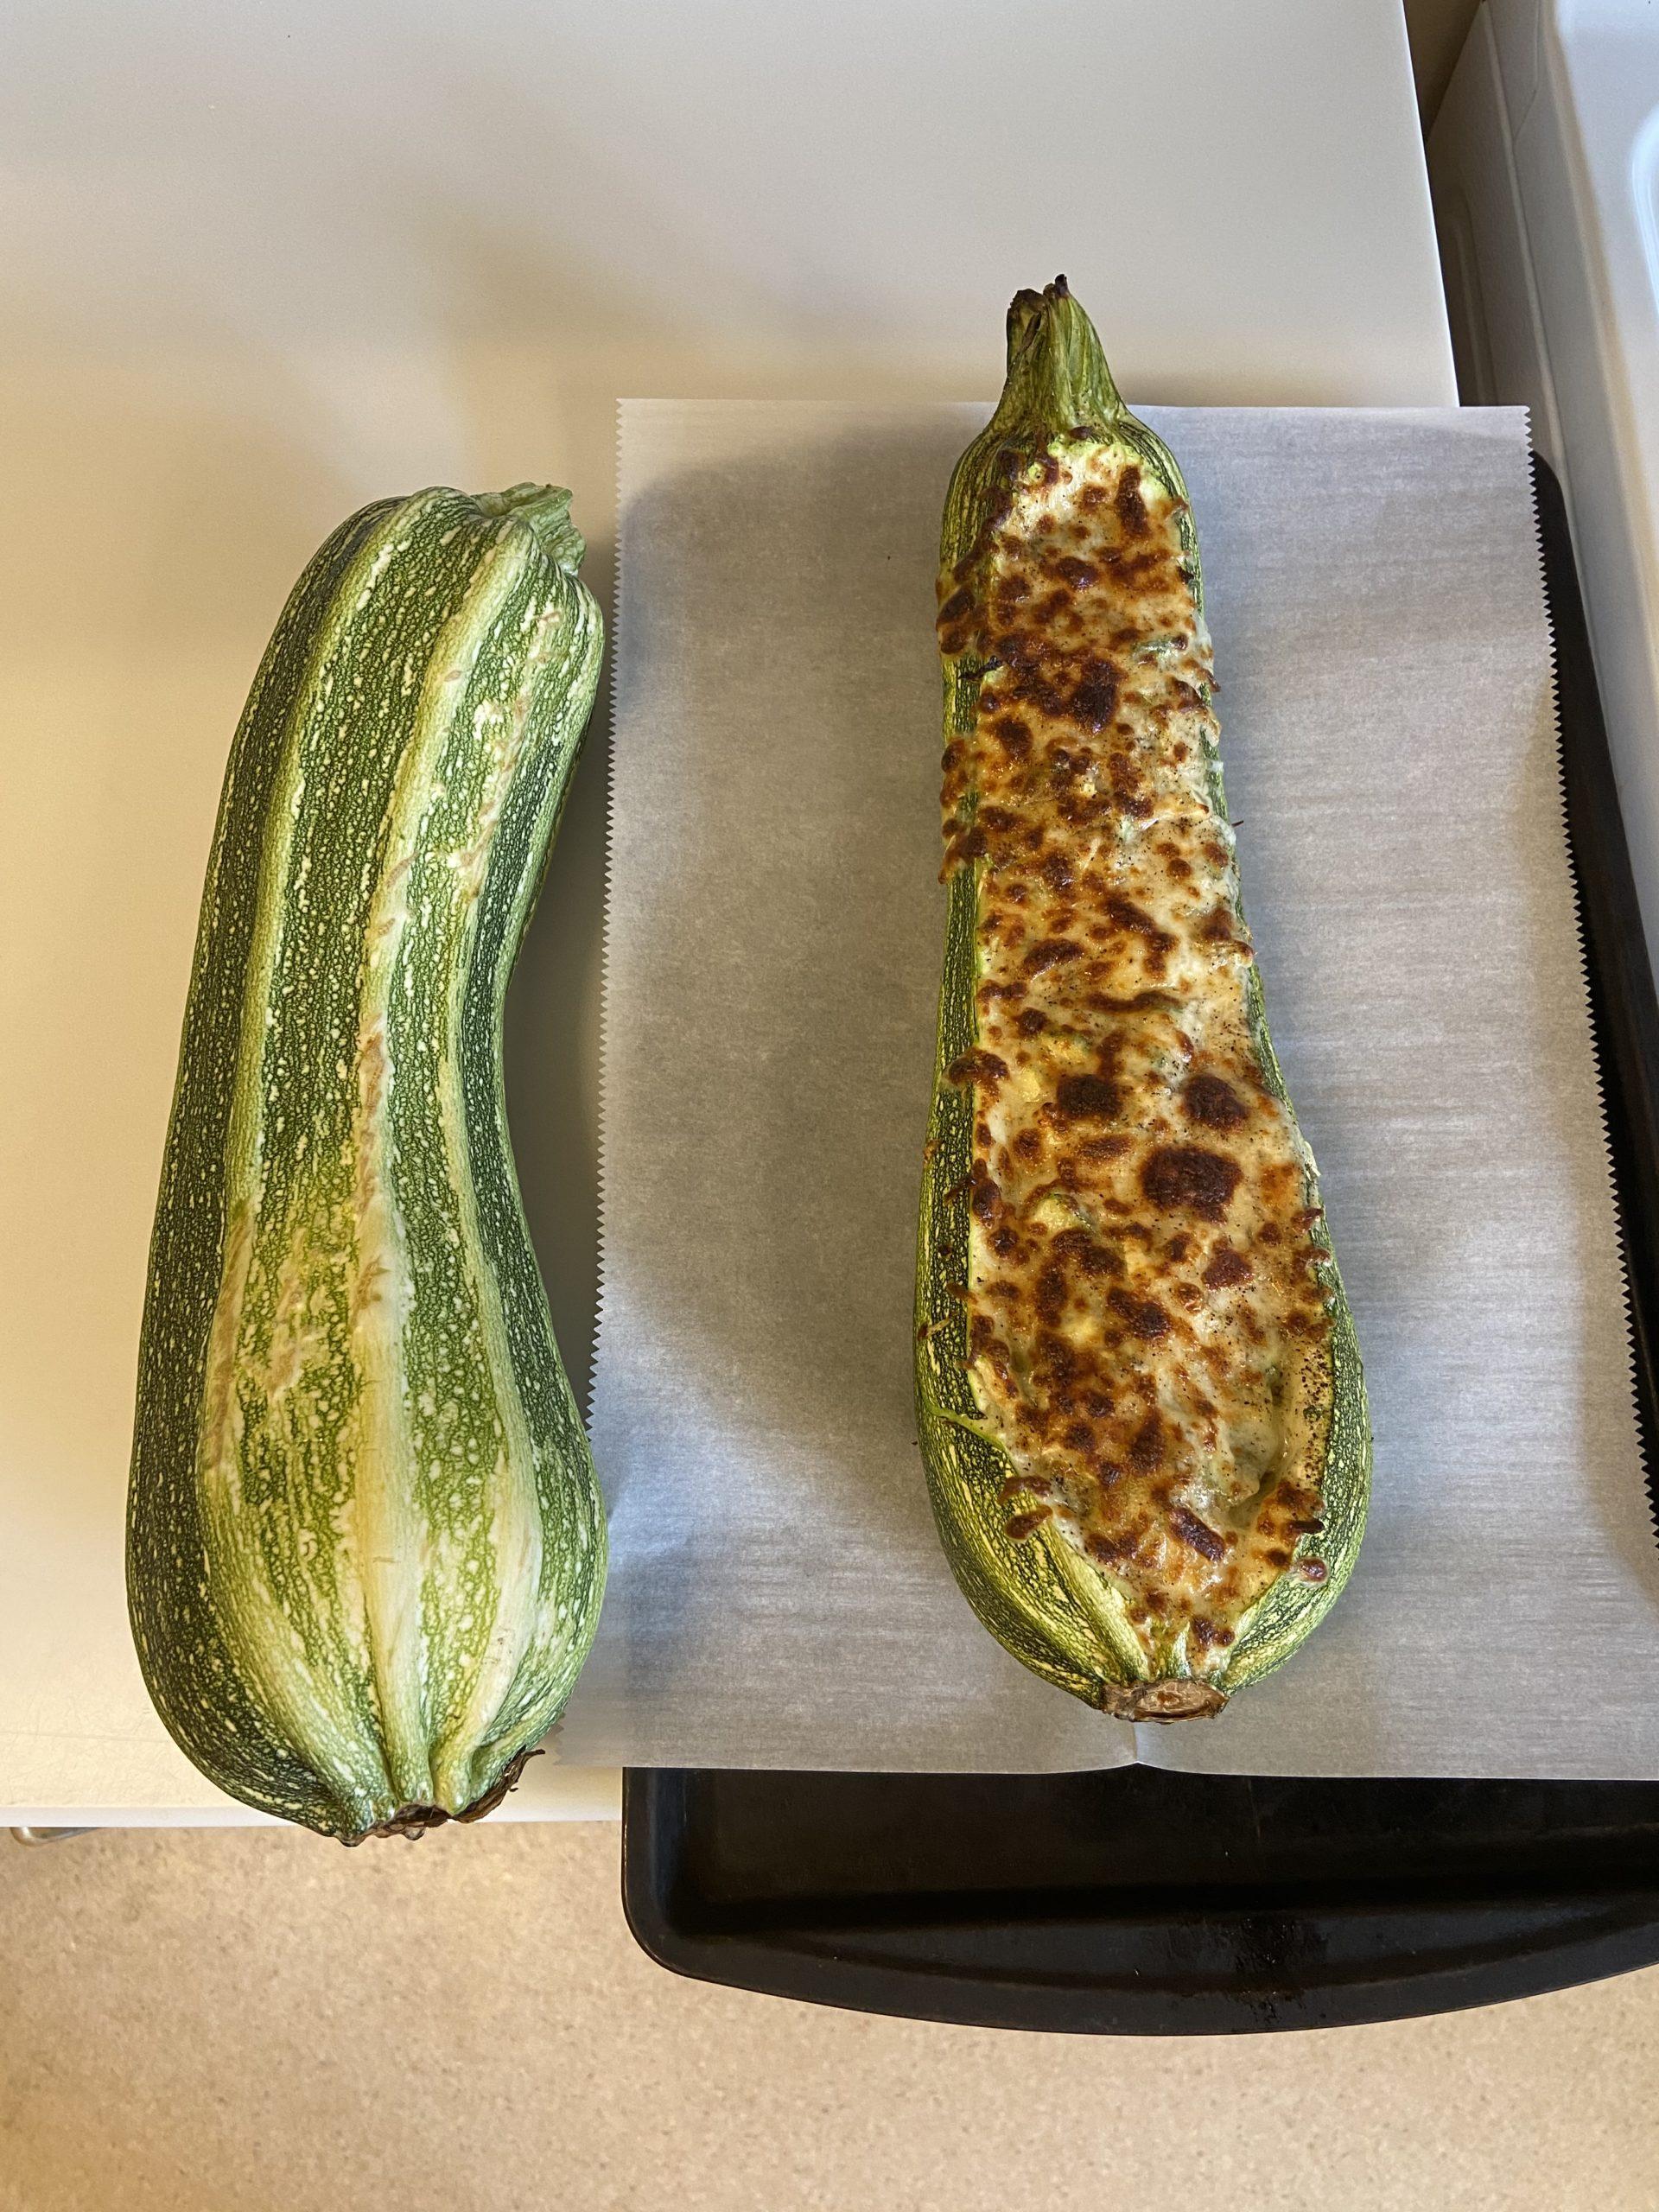 baked zucchini boat